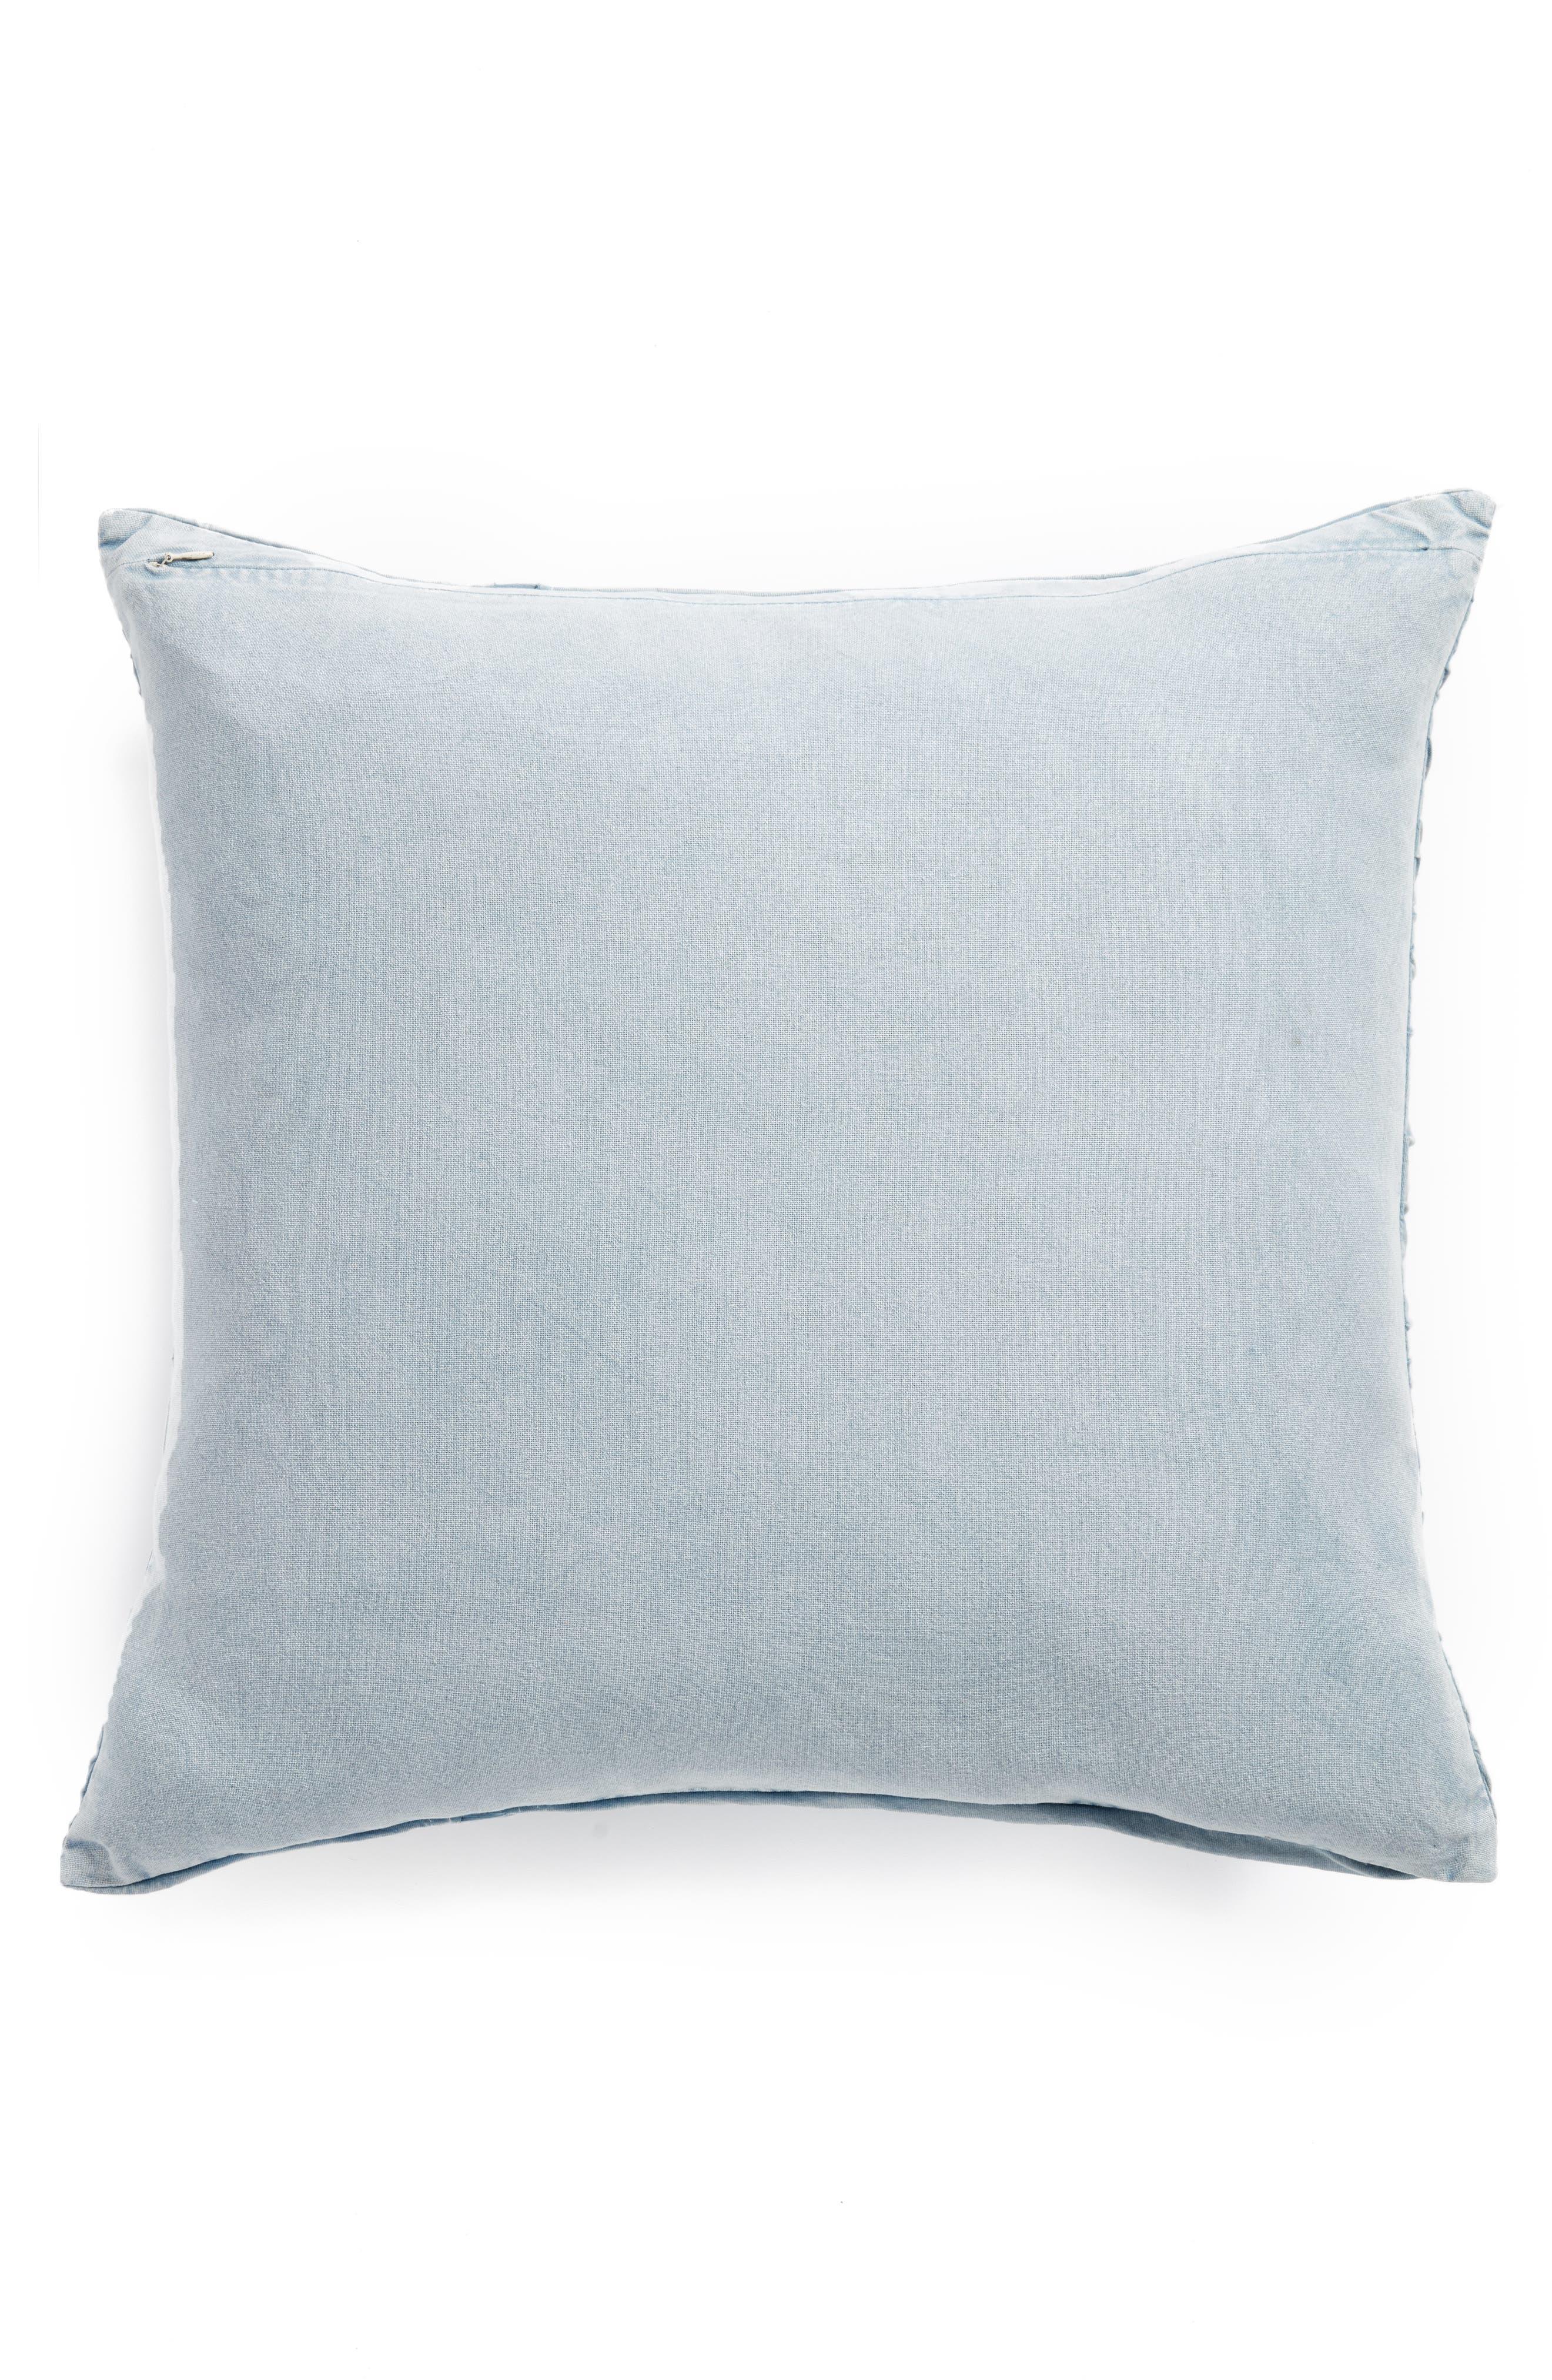 Stonewash Jersey Accent Pillow,                             Alternate thumbnail 2, color,                             Blue Ashley